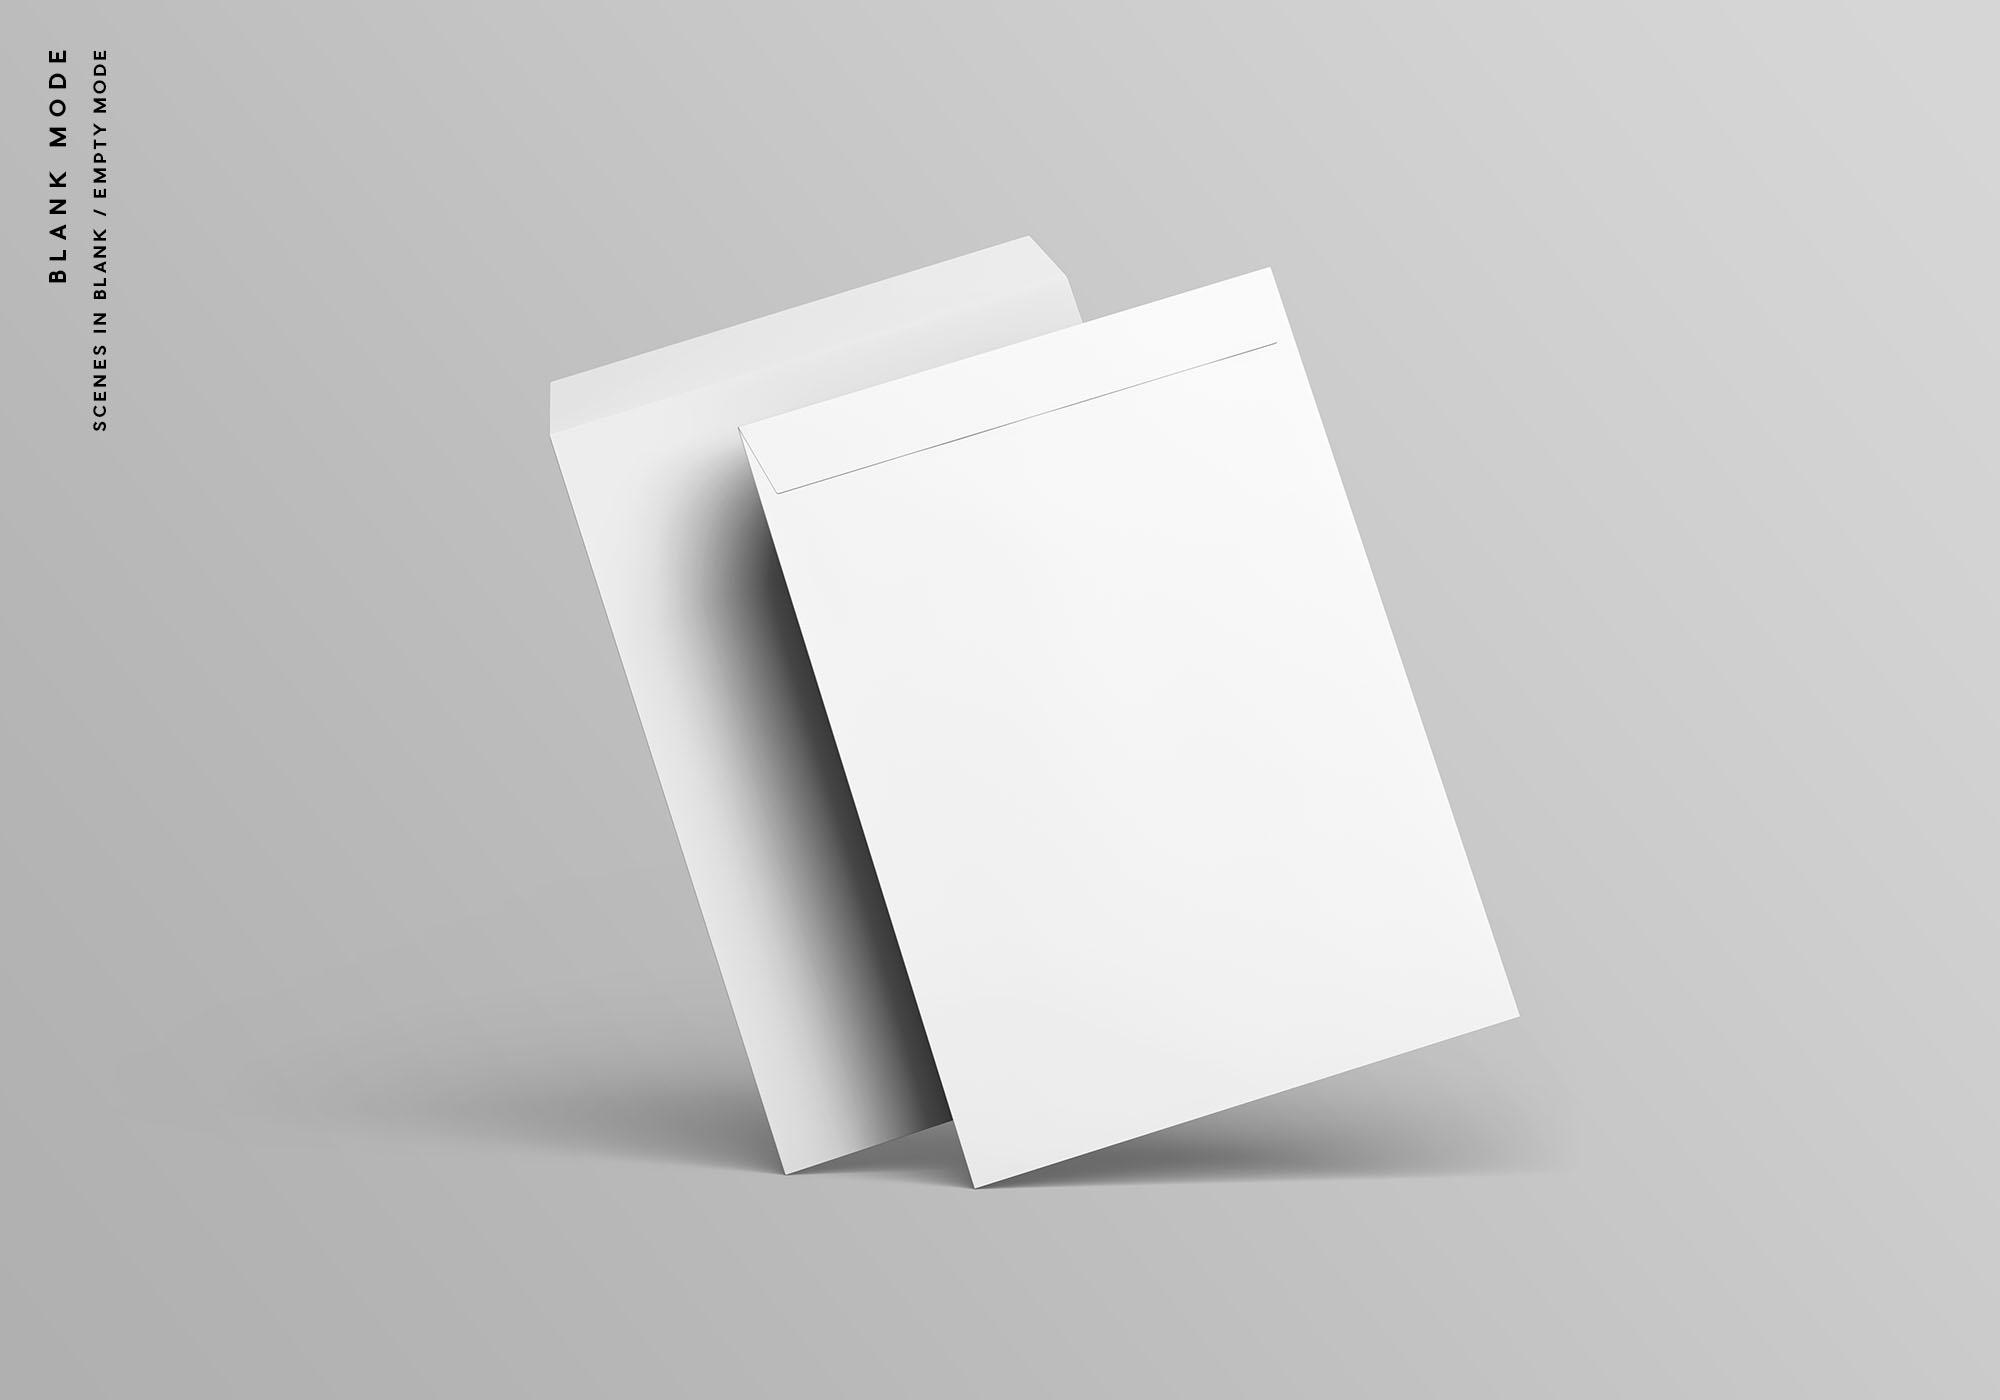 C4 Envelope Mockup - Blank Mode